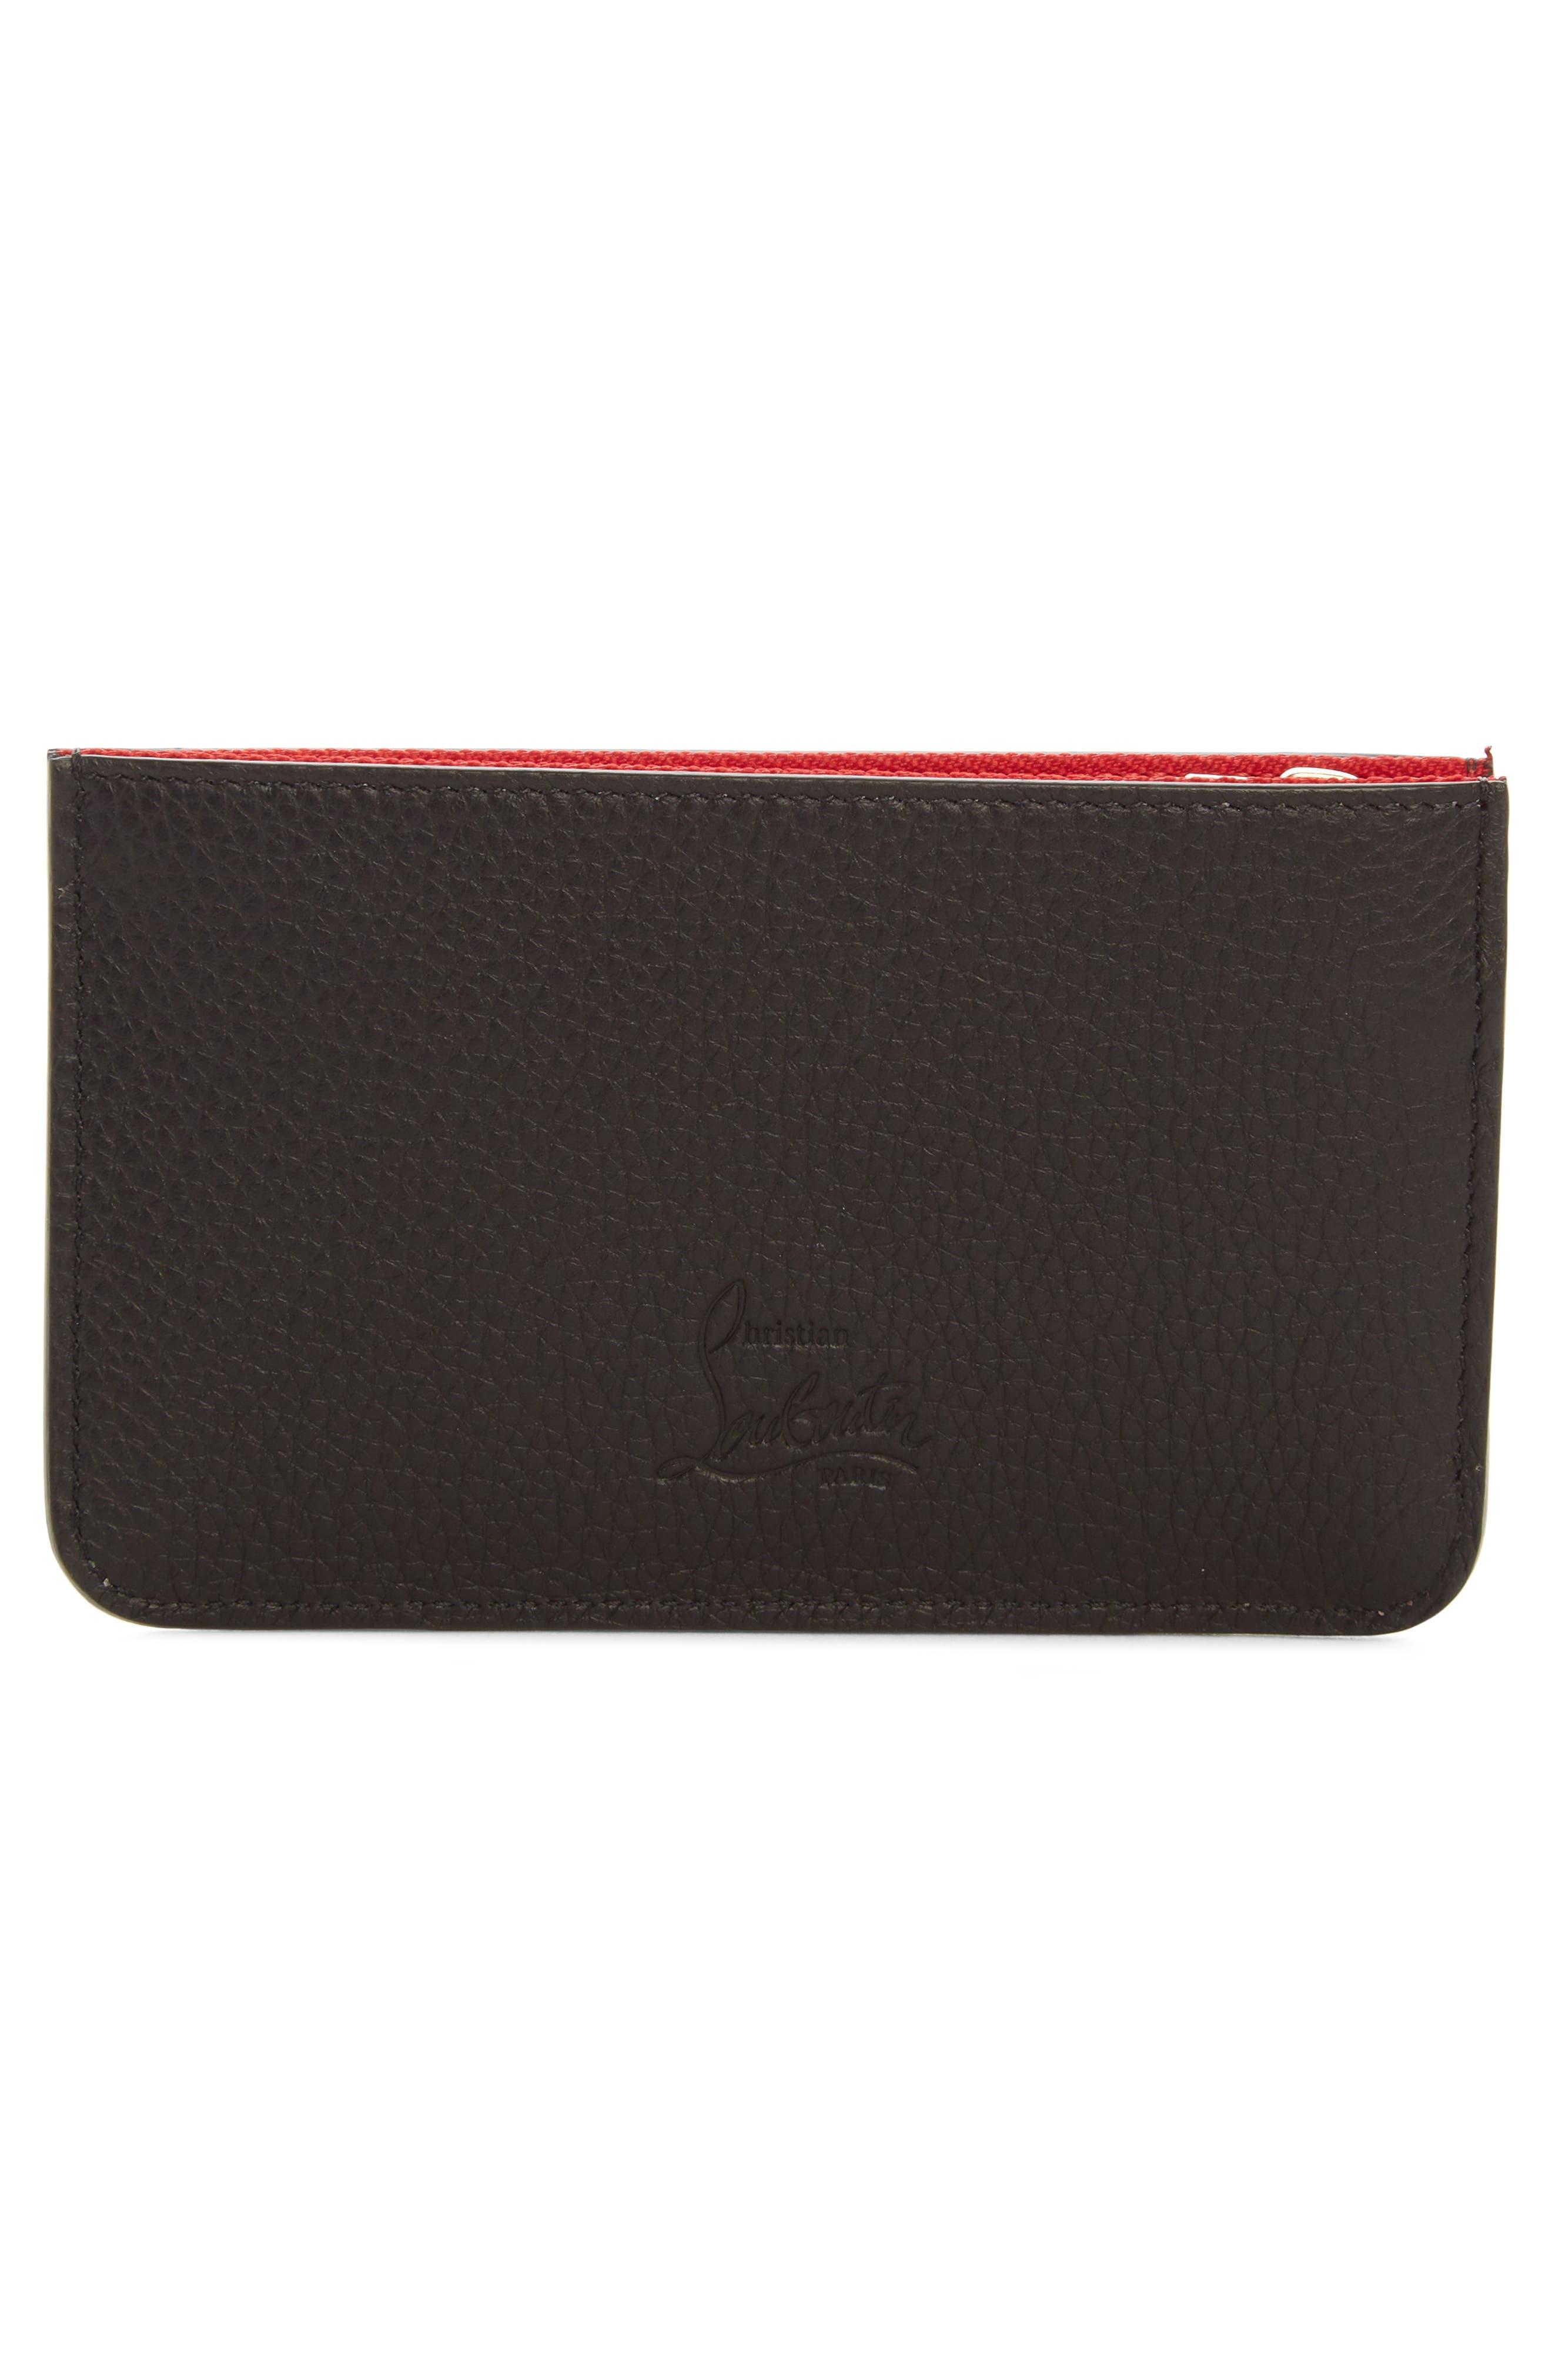 Alternate Image 2  - Christian Louboutin Panettone Studded Leather Key Case